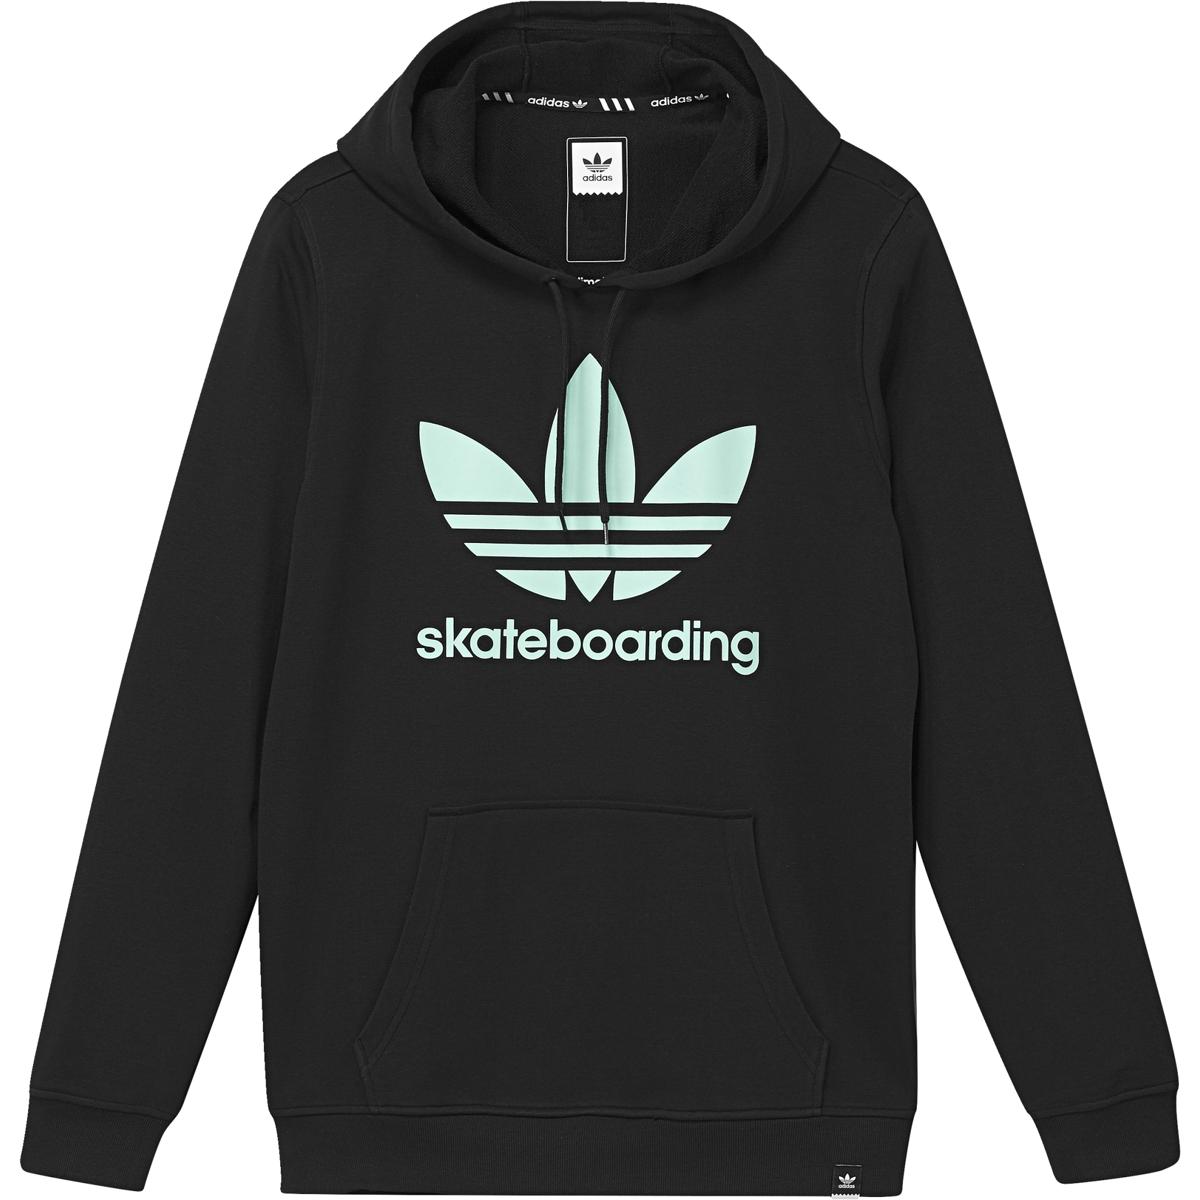 Hoodie Adidas Superstar Adidas Originals Bluza, PNG